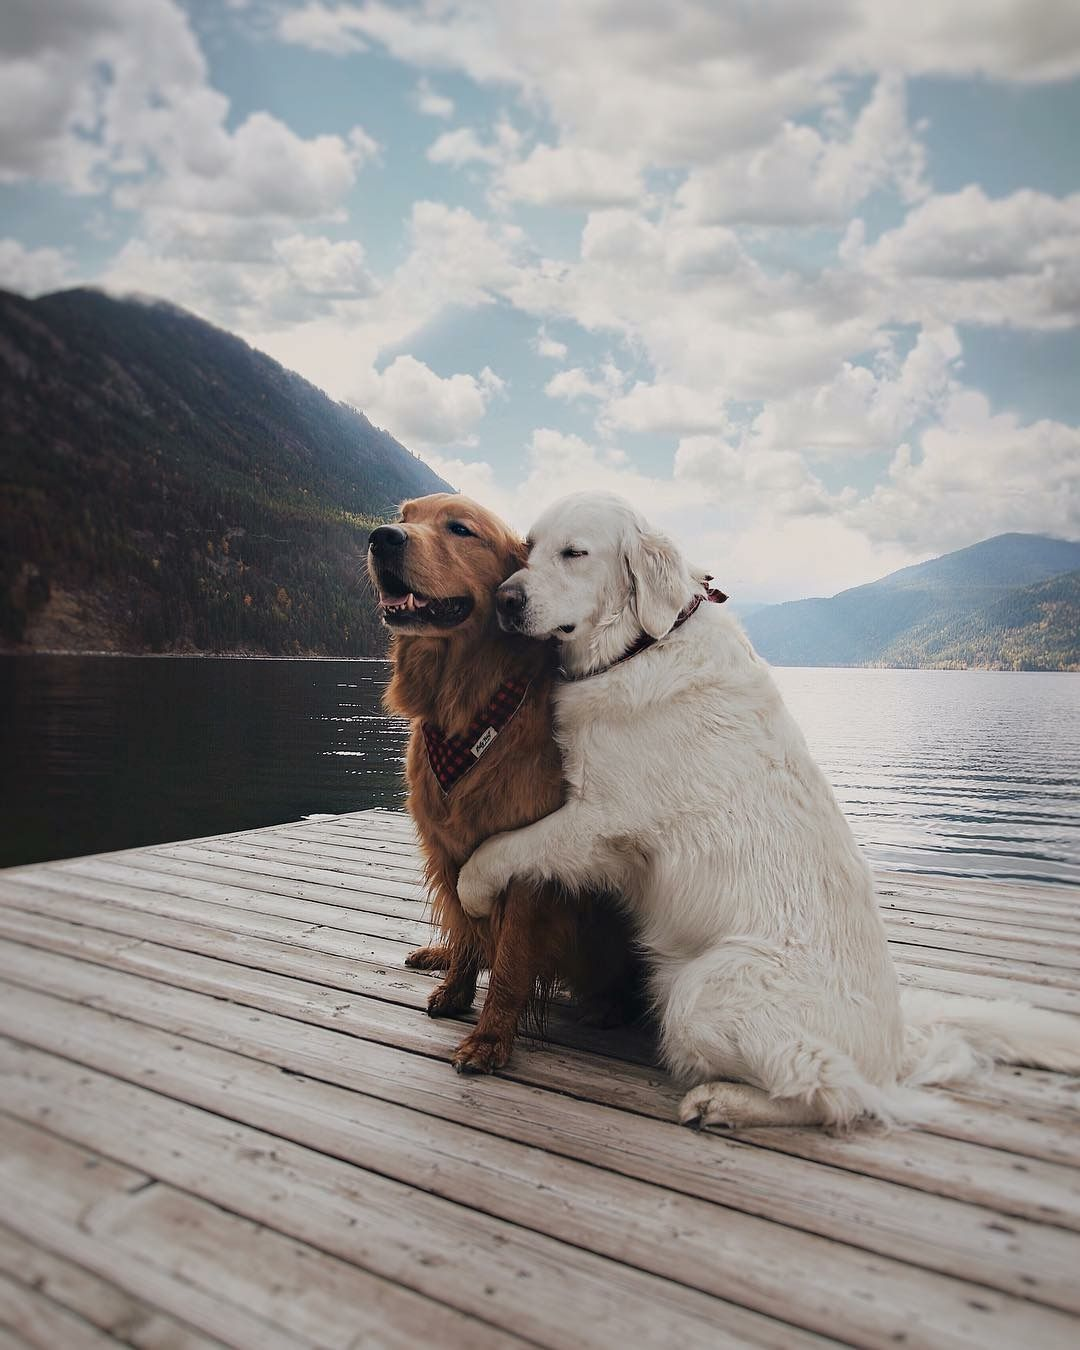 Awwwwwwwwwwwwwwwwwwwwwwww | Animals beautiful, Dogs, Puppies